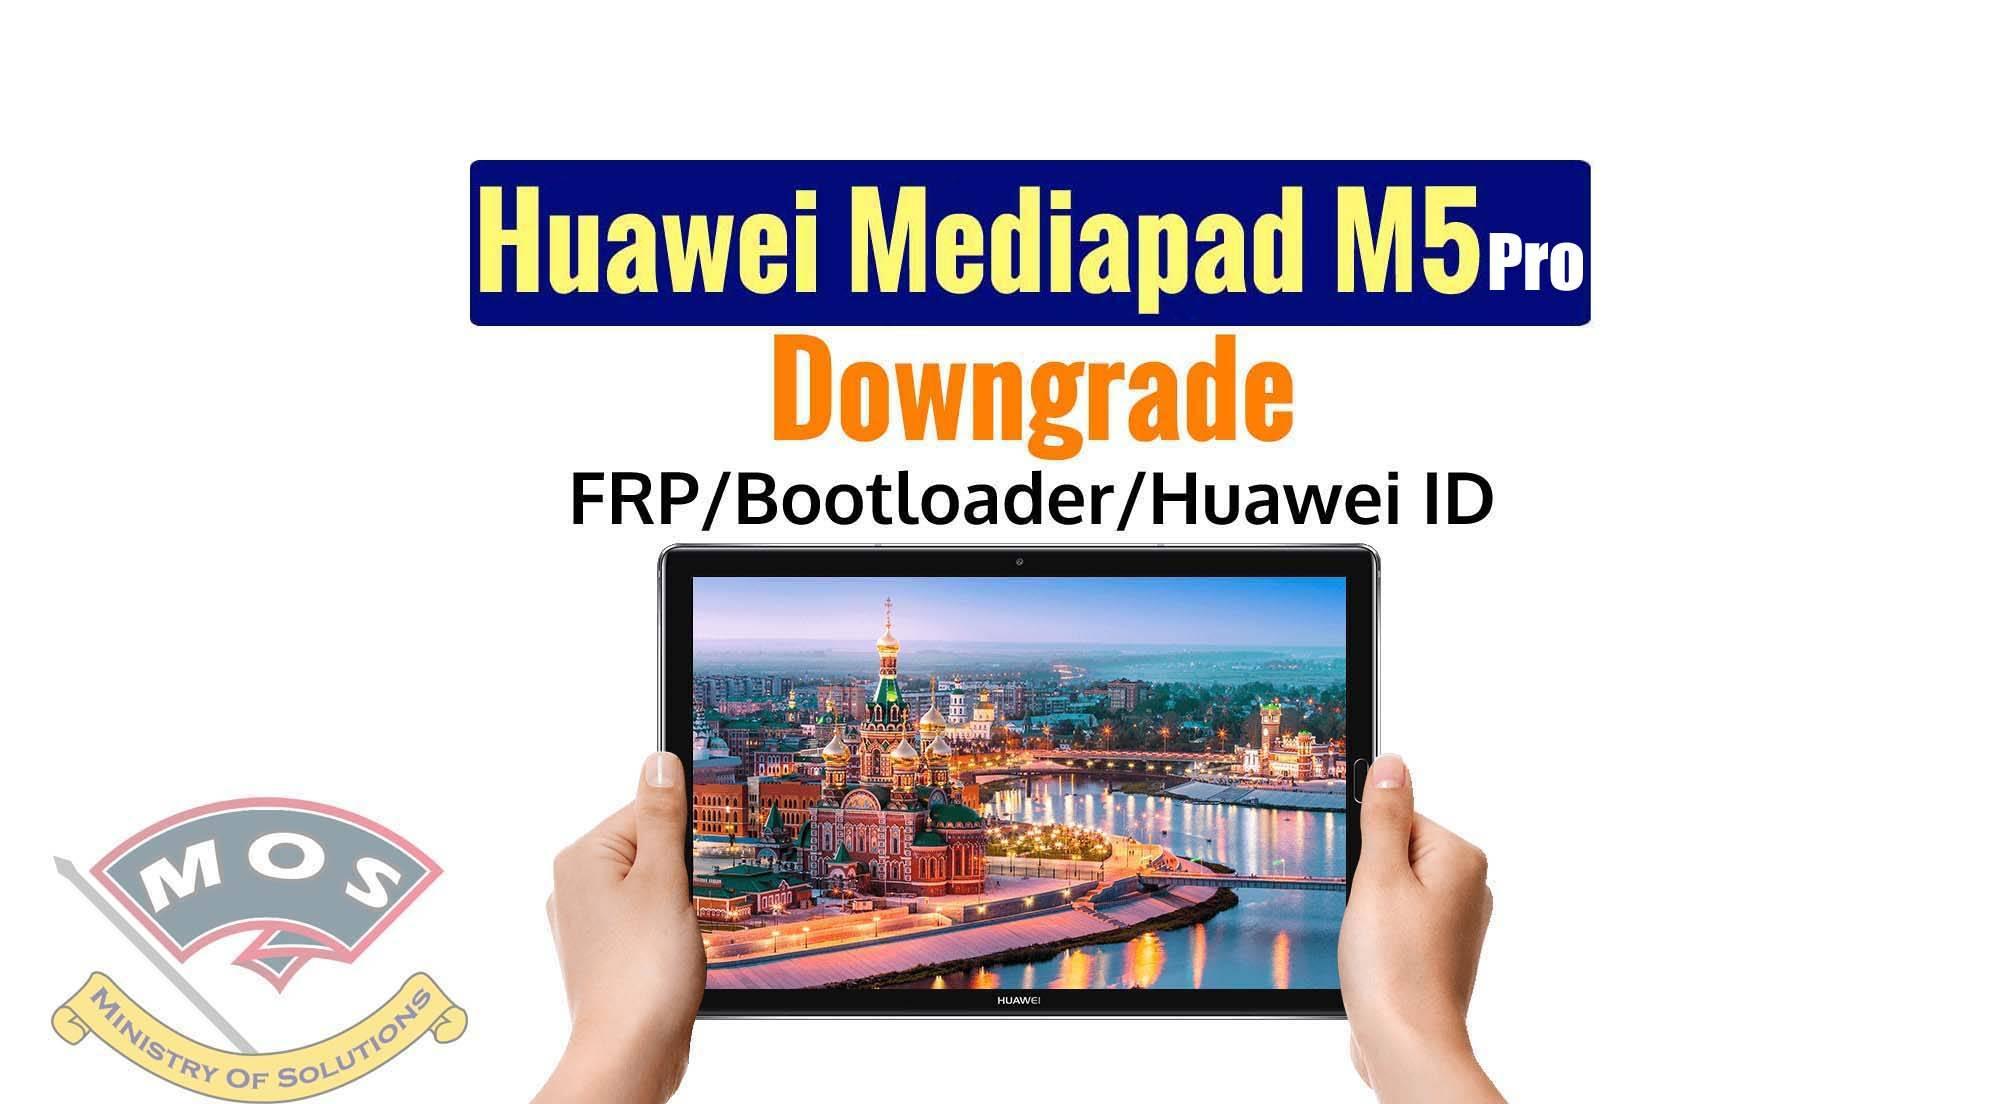 Huawei Mediapad M5 Pro Downgrade for Bootloader (CMR-AL19